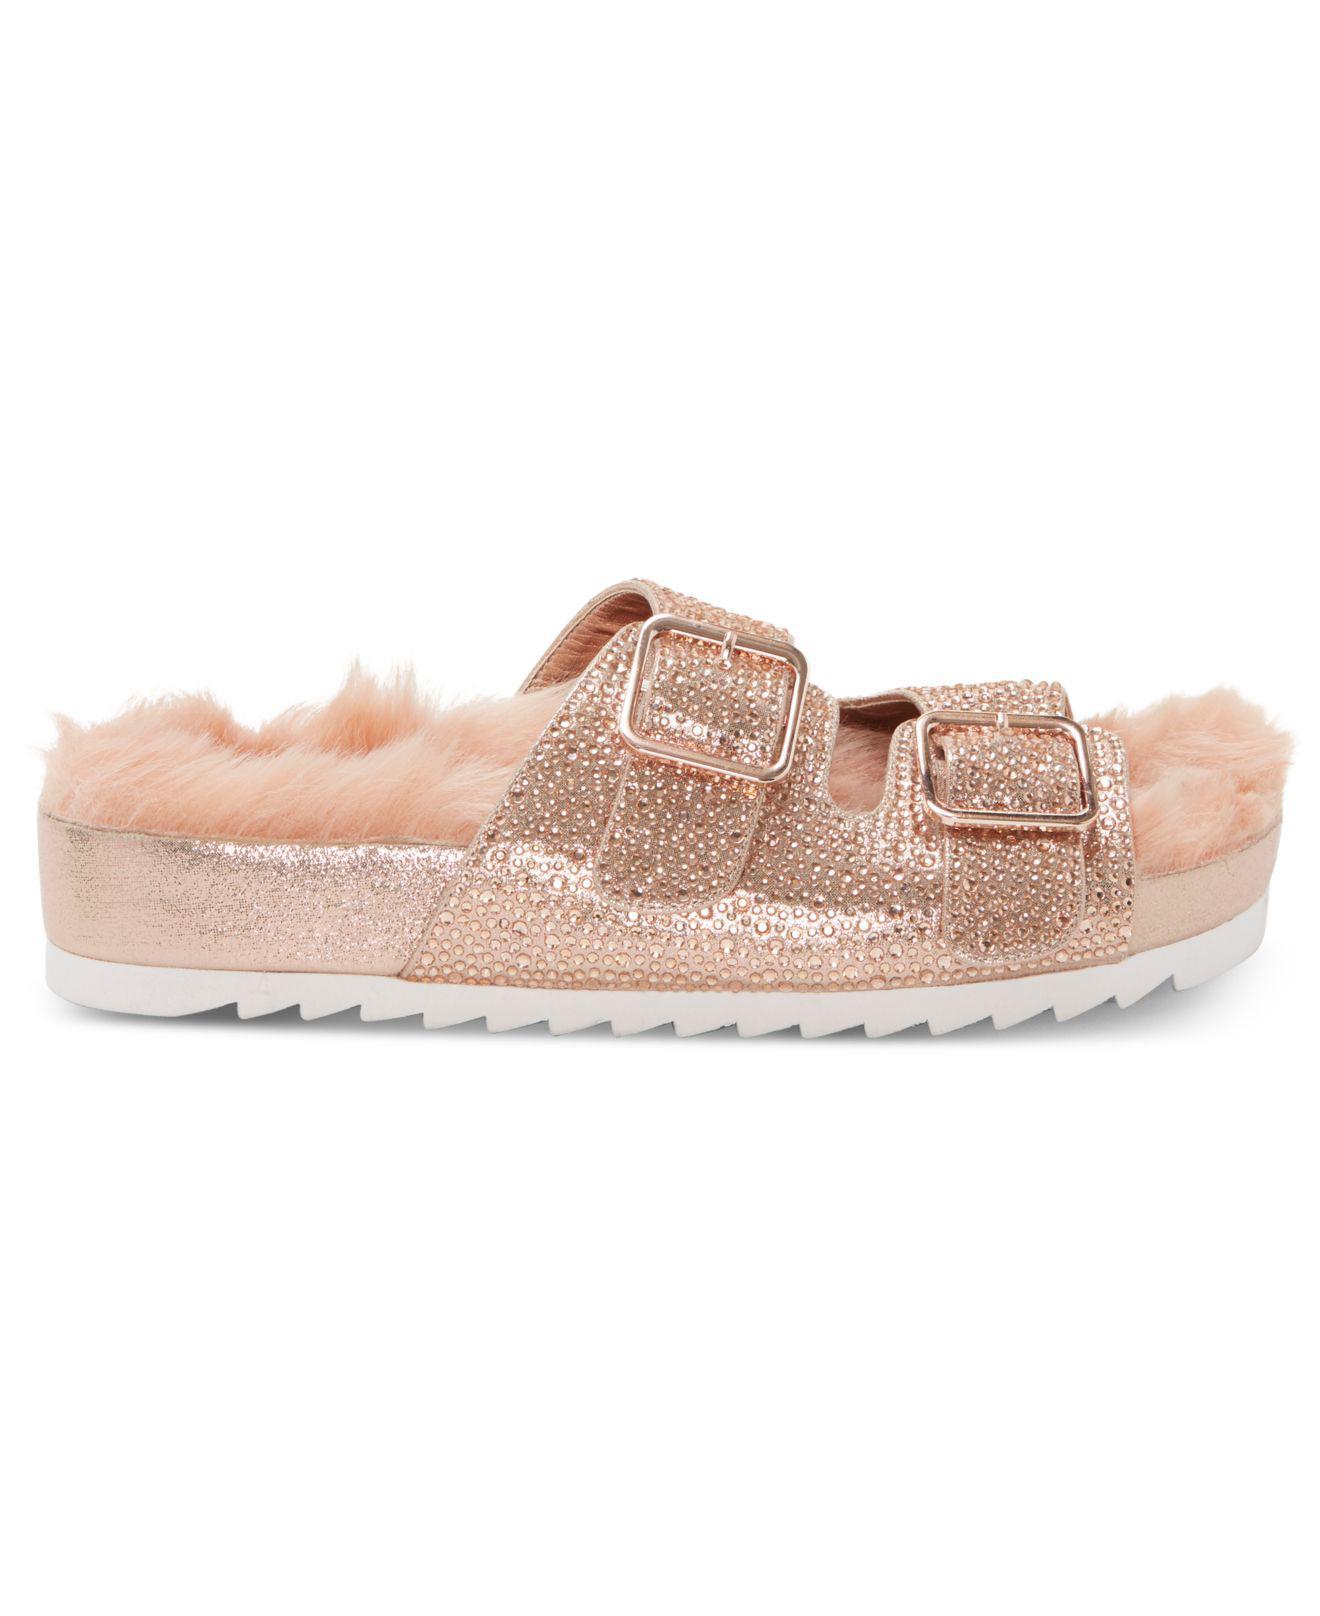 310f434a2a4cd1 Lyst - Inc International Concepts Alani Footbed Flat Sandals ...